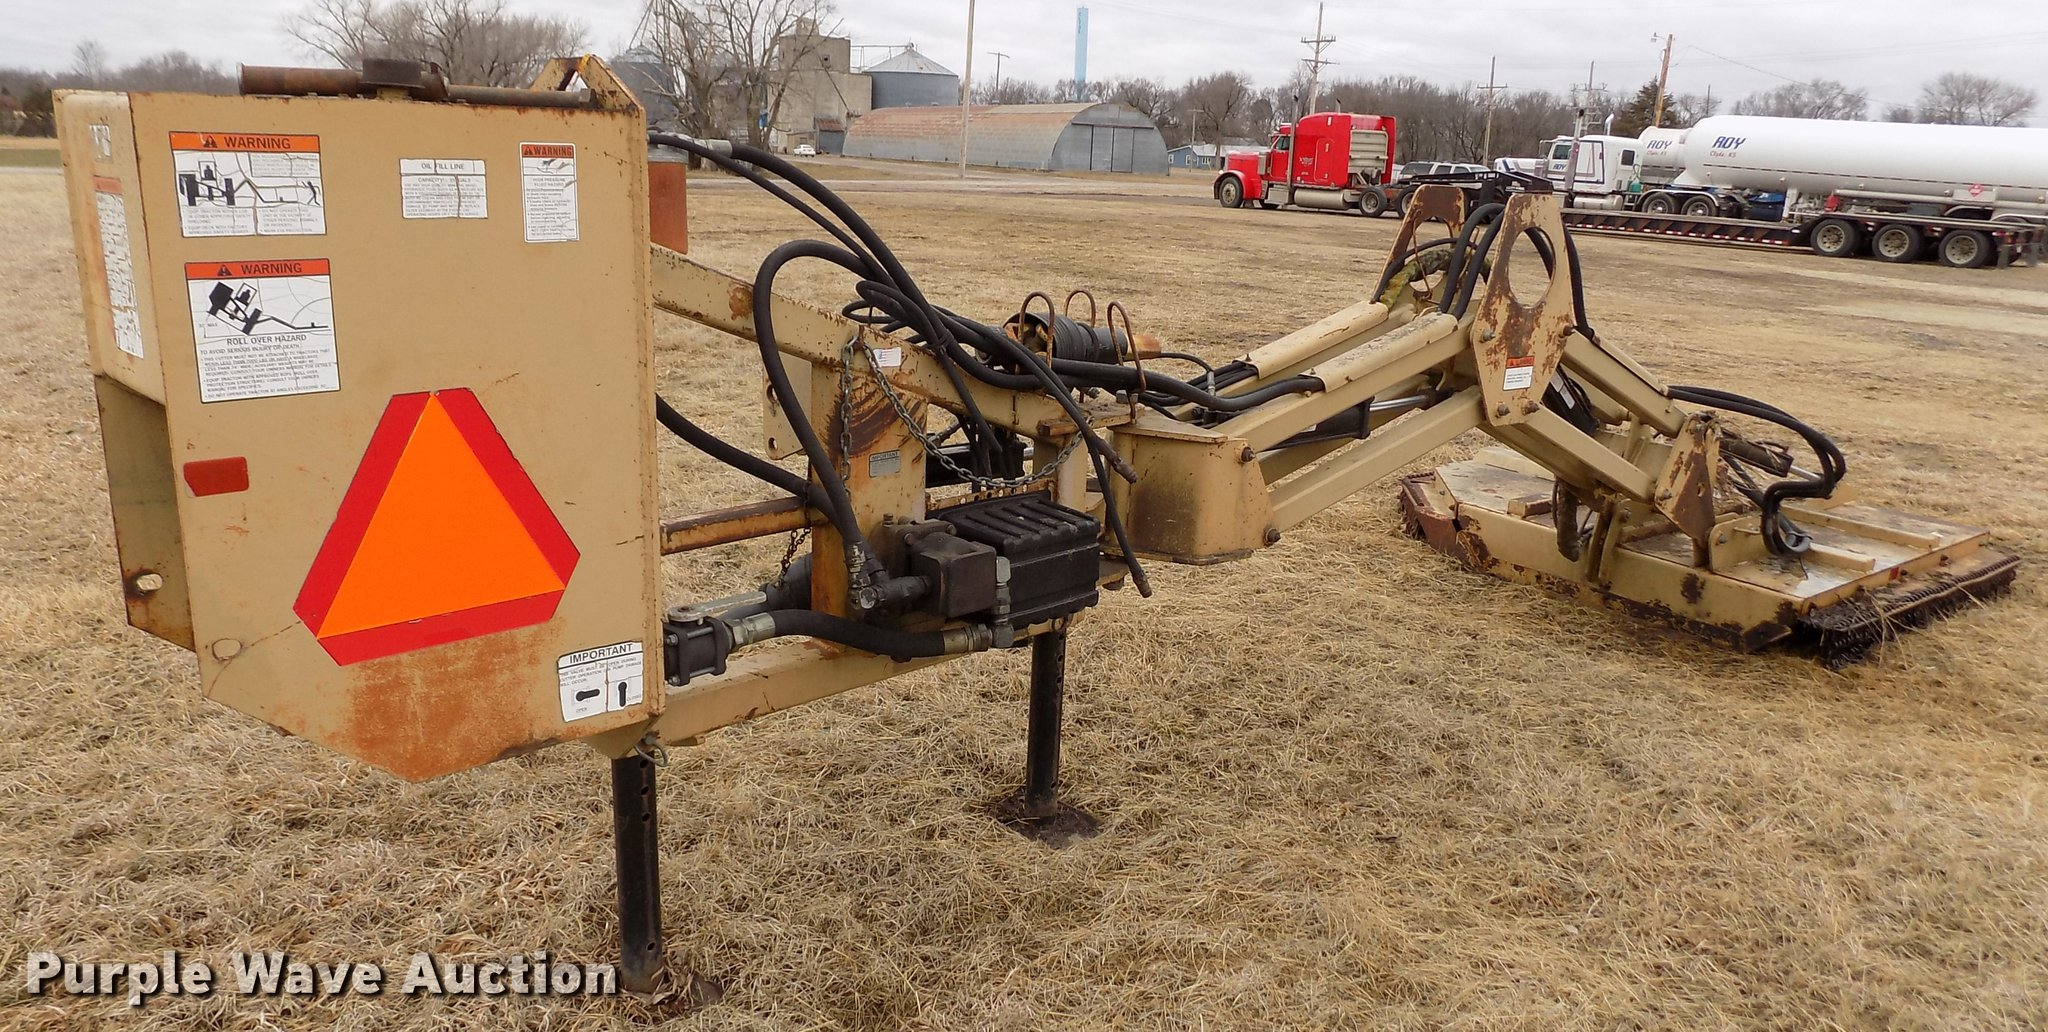 Land Pride RCP 2560 boom mower | Item FA9540 | Wednesday Apr